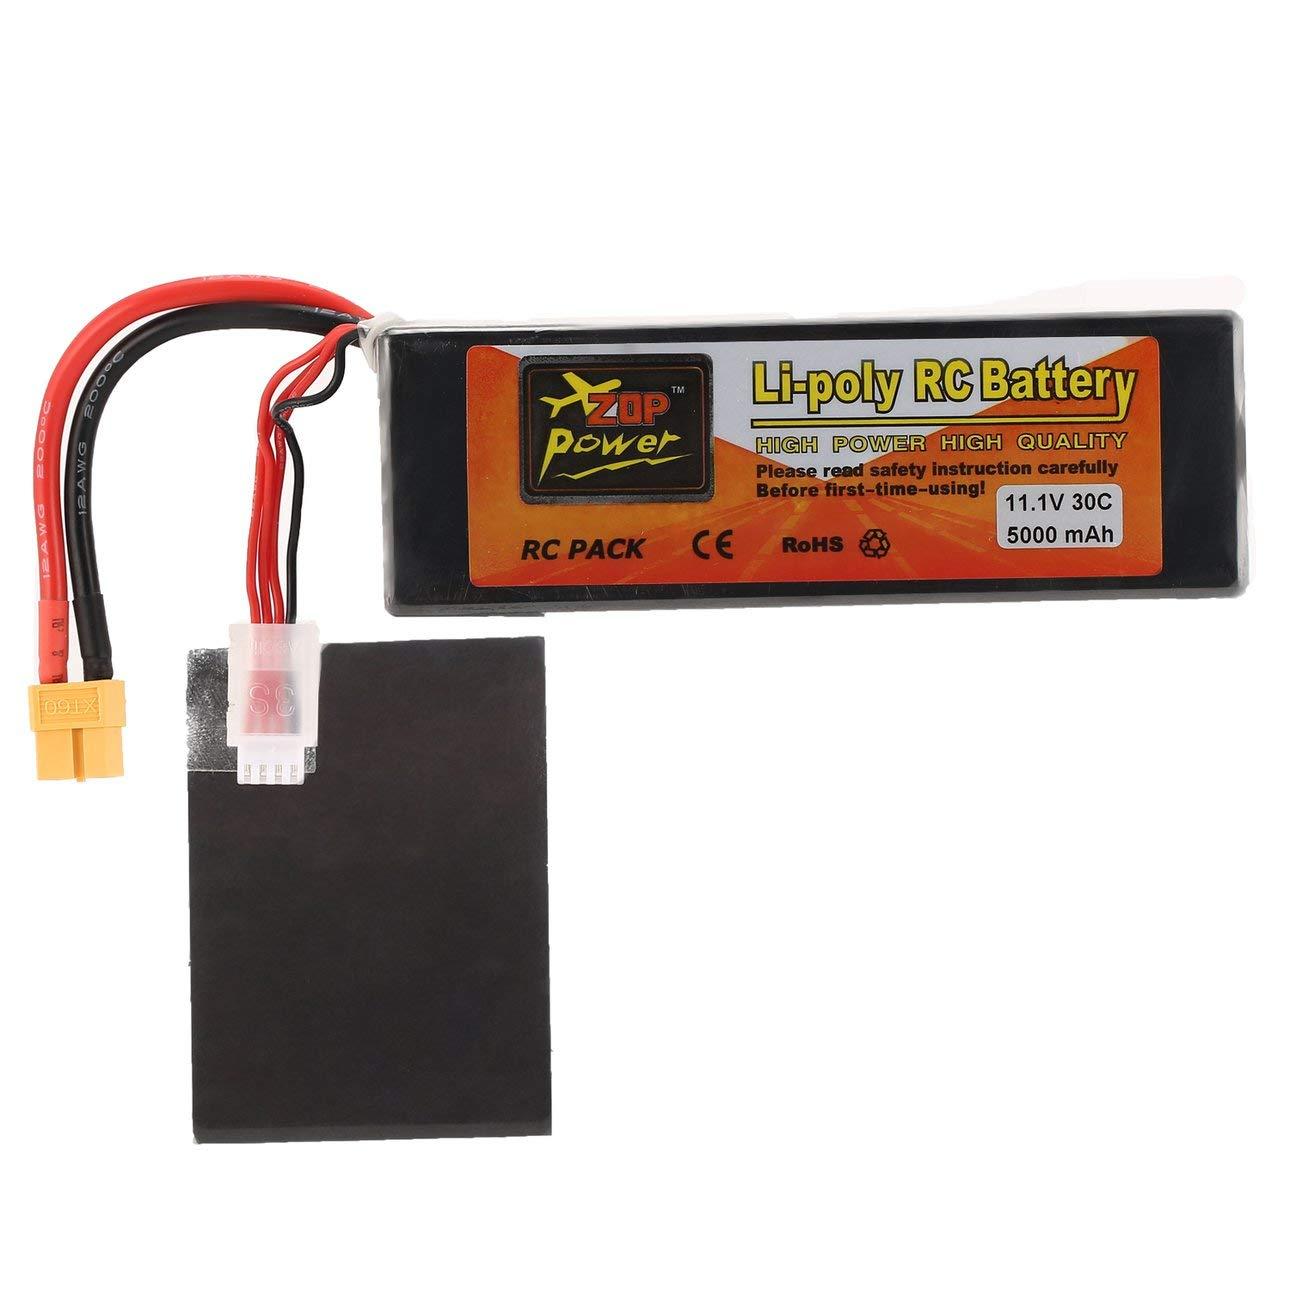 2Pcs ZOP Power 14.8V 4500mAh 4S 45C Lipo Battery XT60 Plug For RC Car Boat Quadc